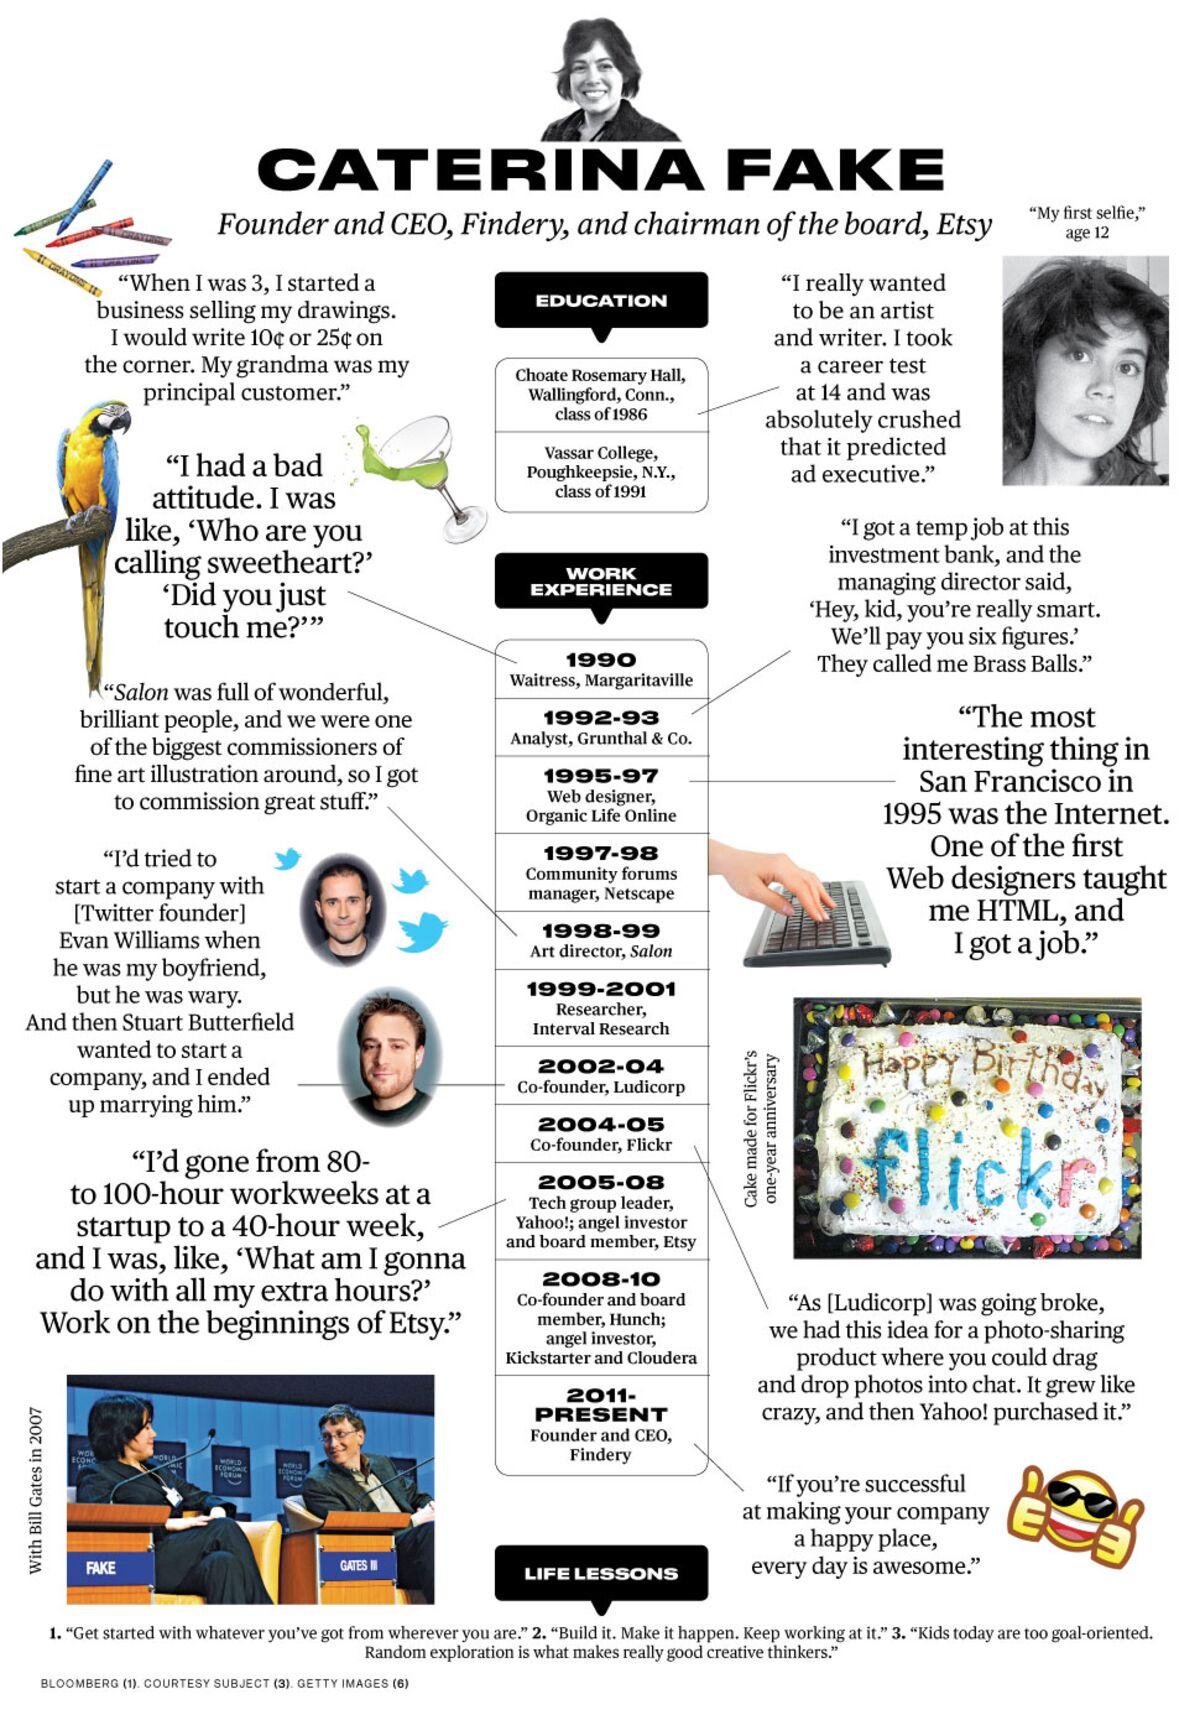 Tech Entrepreneur Caterina Fake's Career Path - Bloomberg